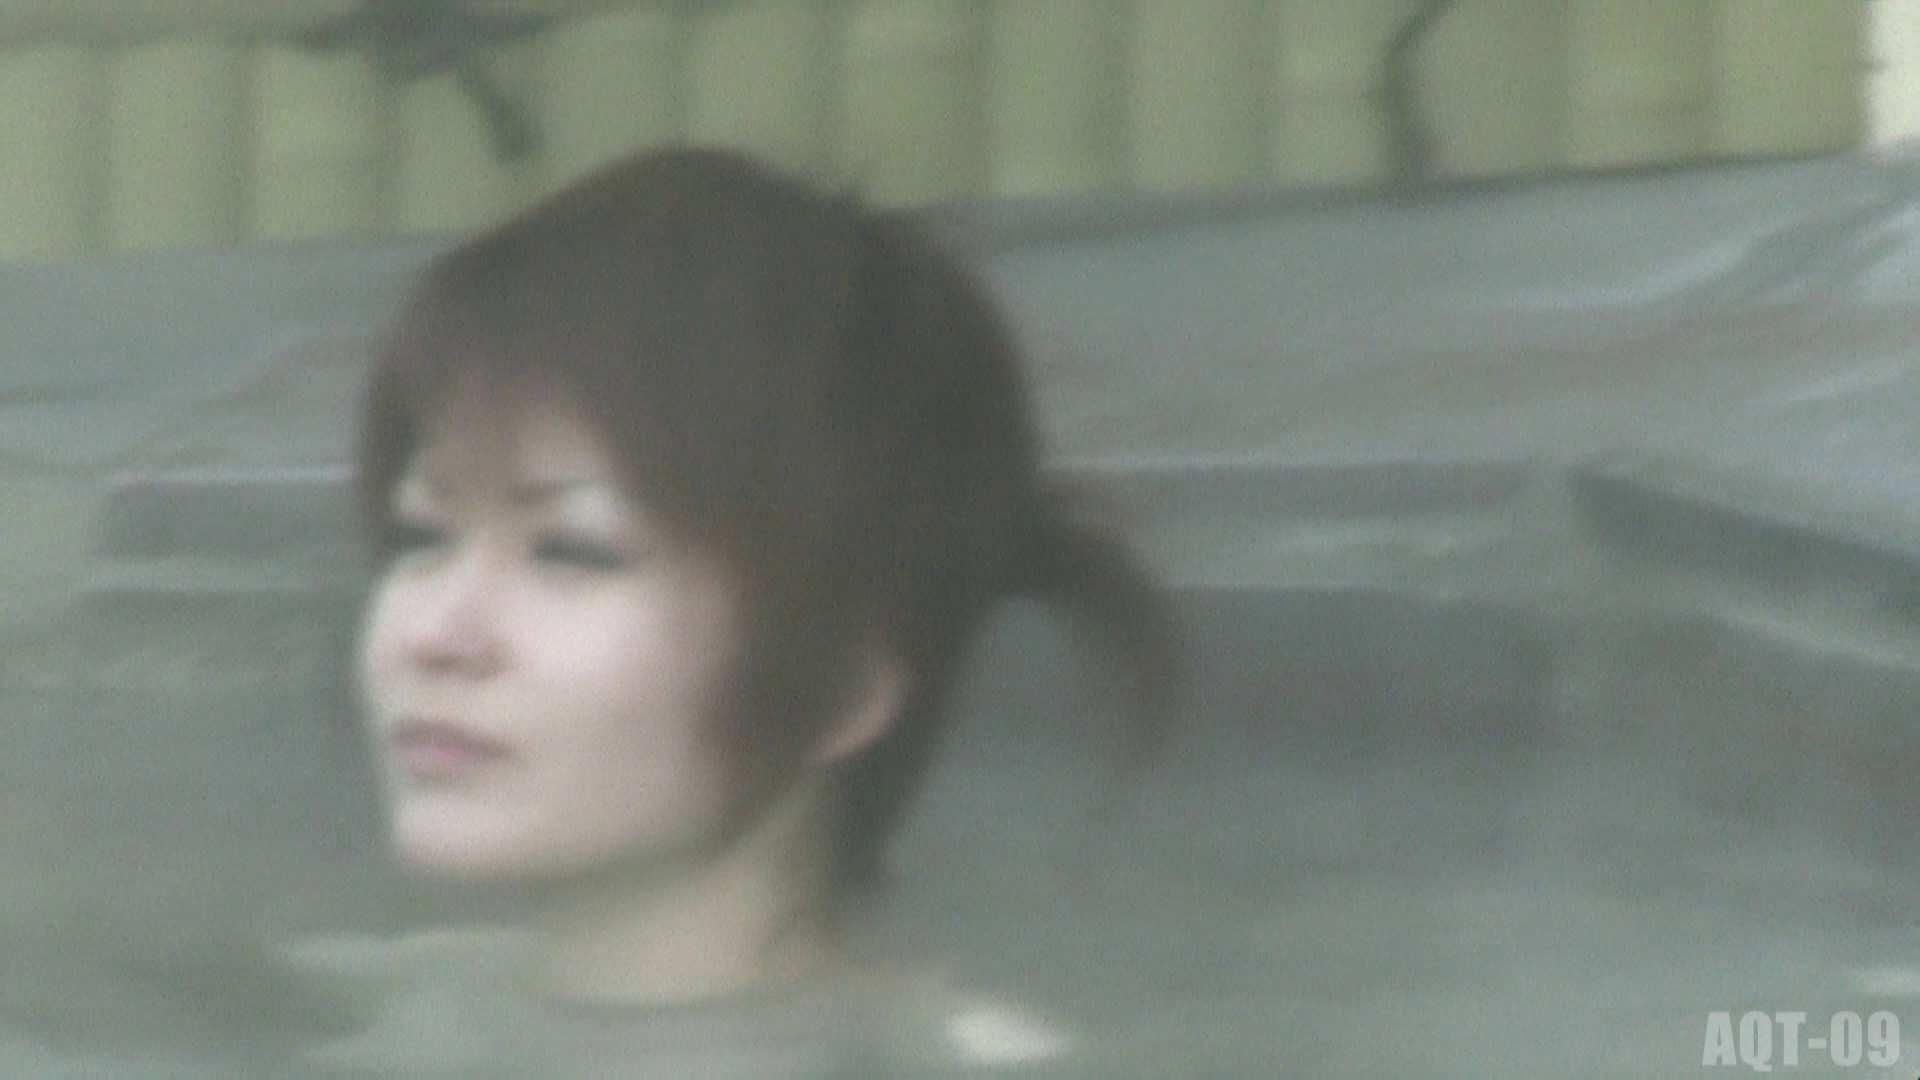 Aquaな露天風呂Vol.779 盗撮 SEX無修正画像 81連発 23